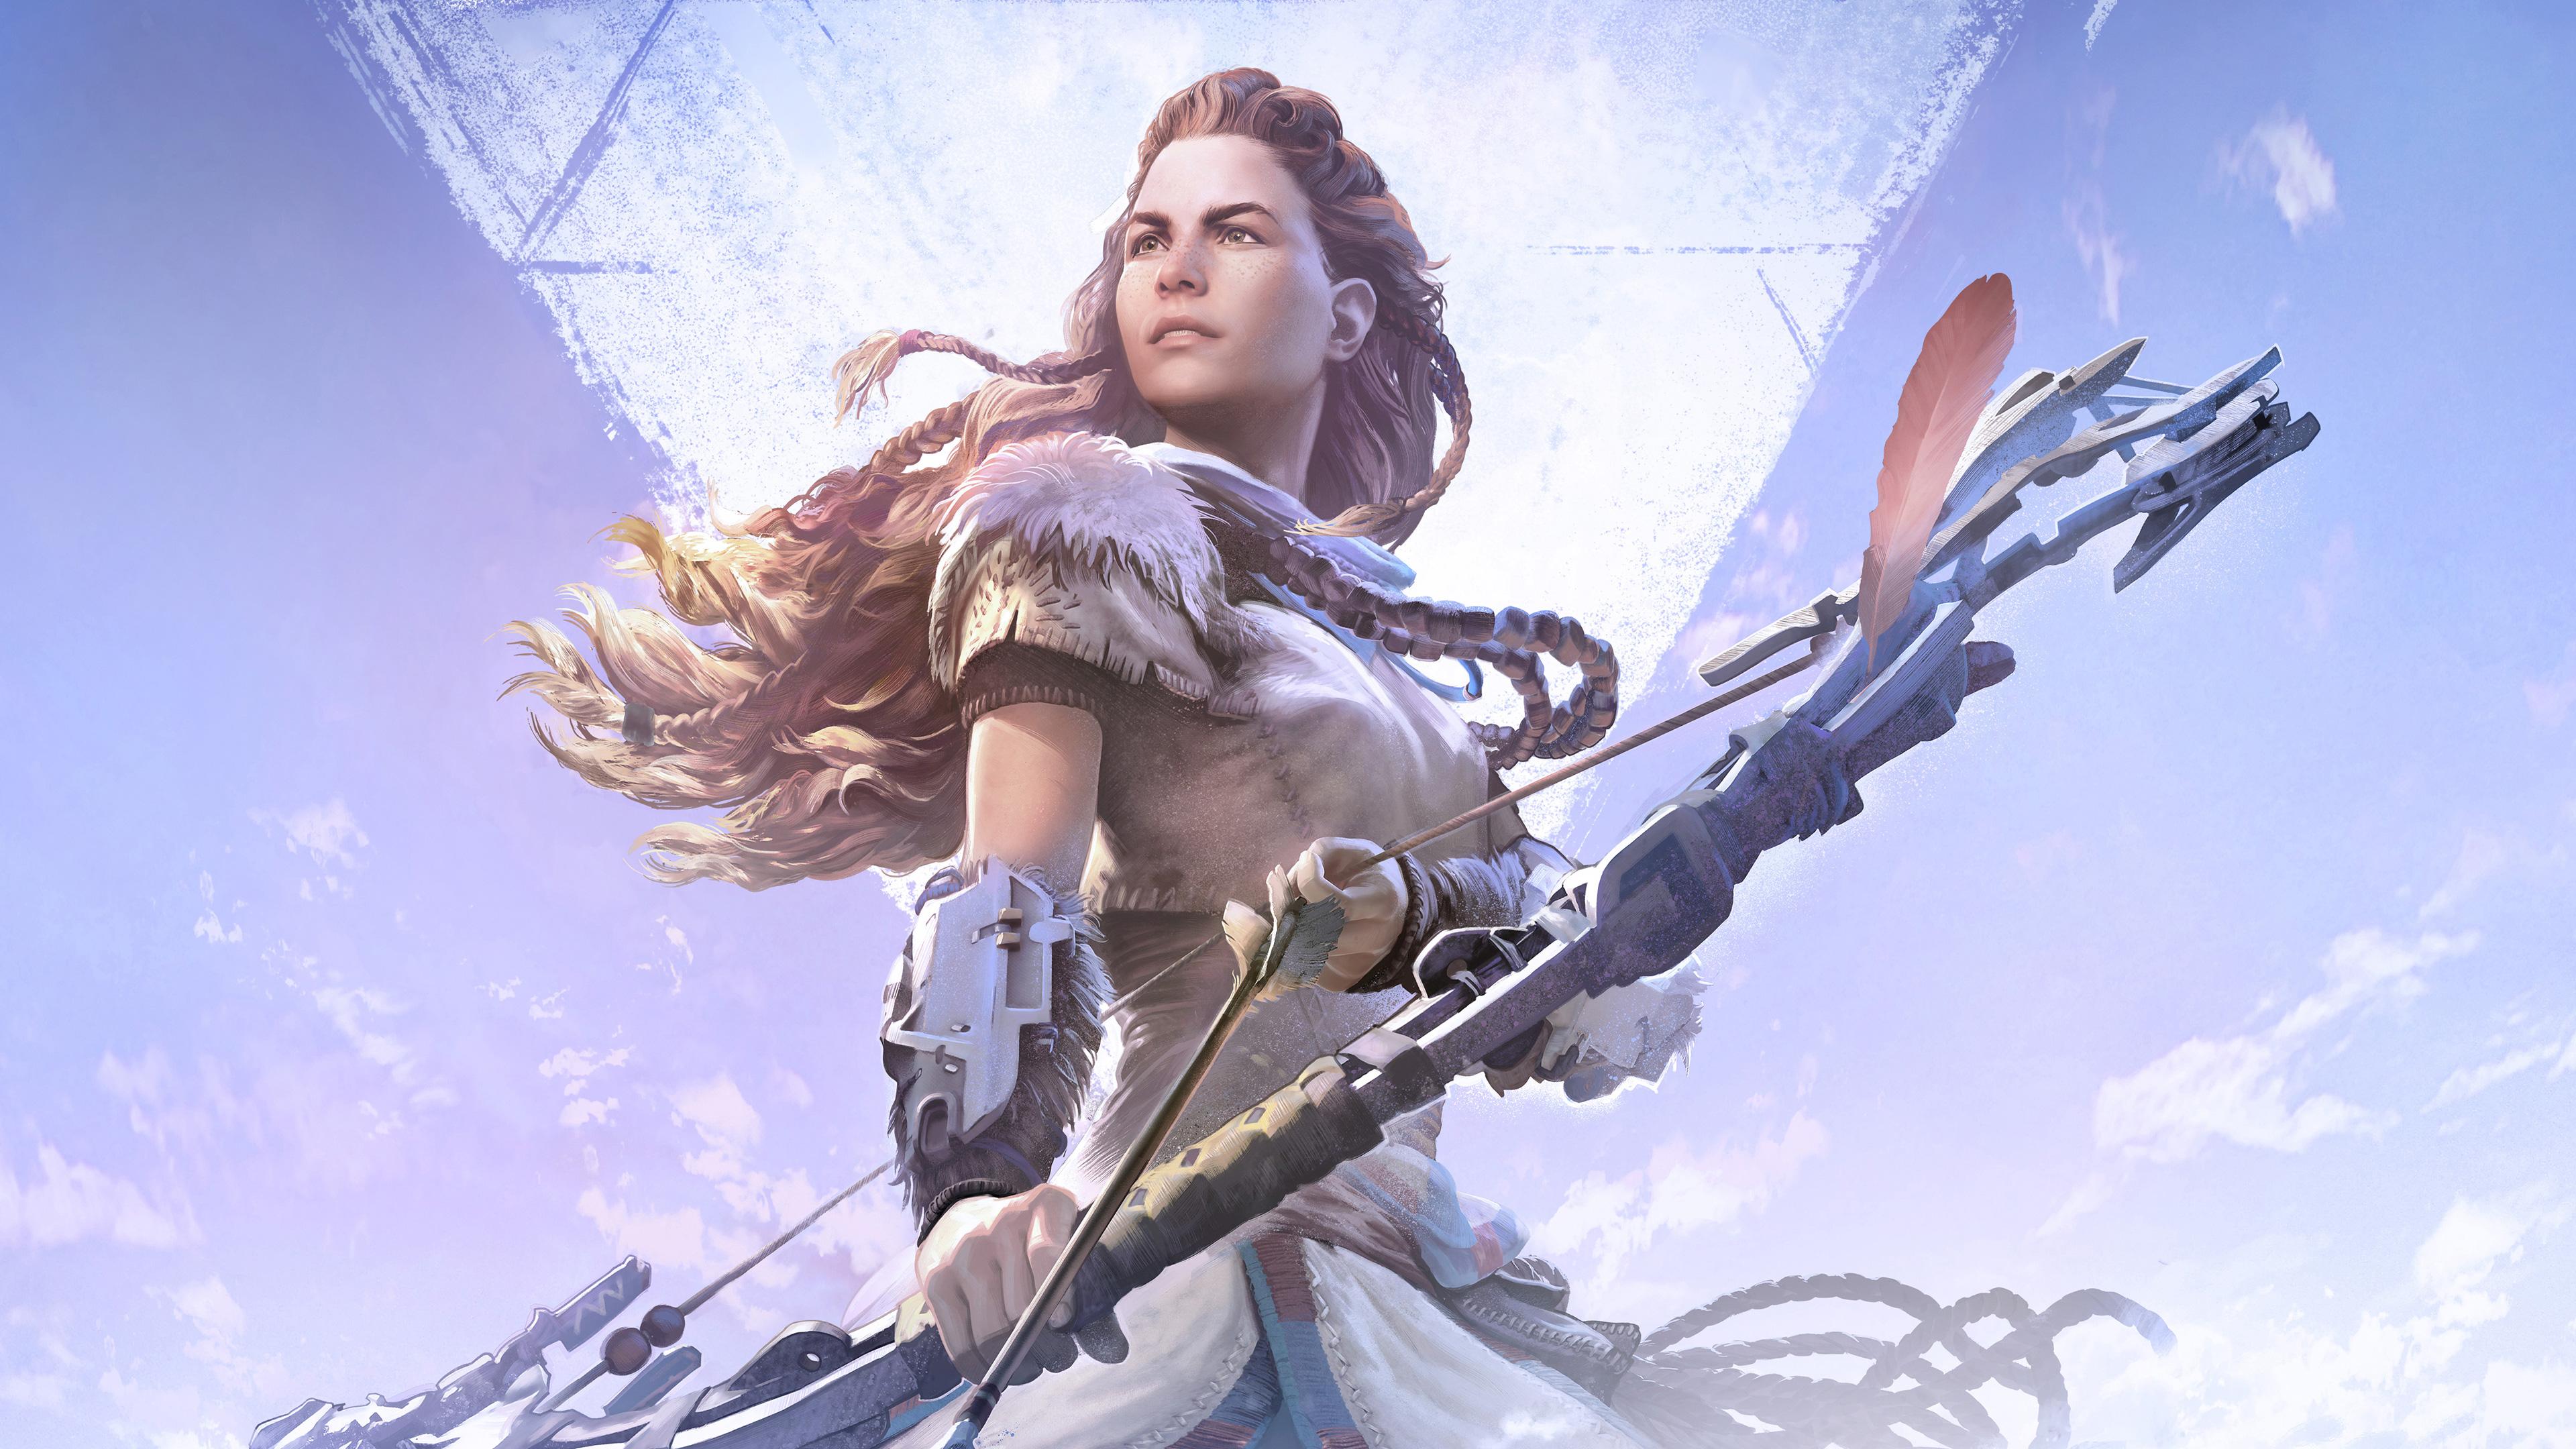 Aloy Horizon Zero Dawn Complete Edition Hd Games 4k Wallpapers